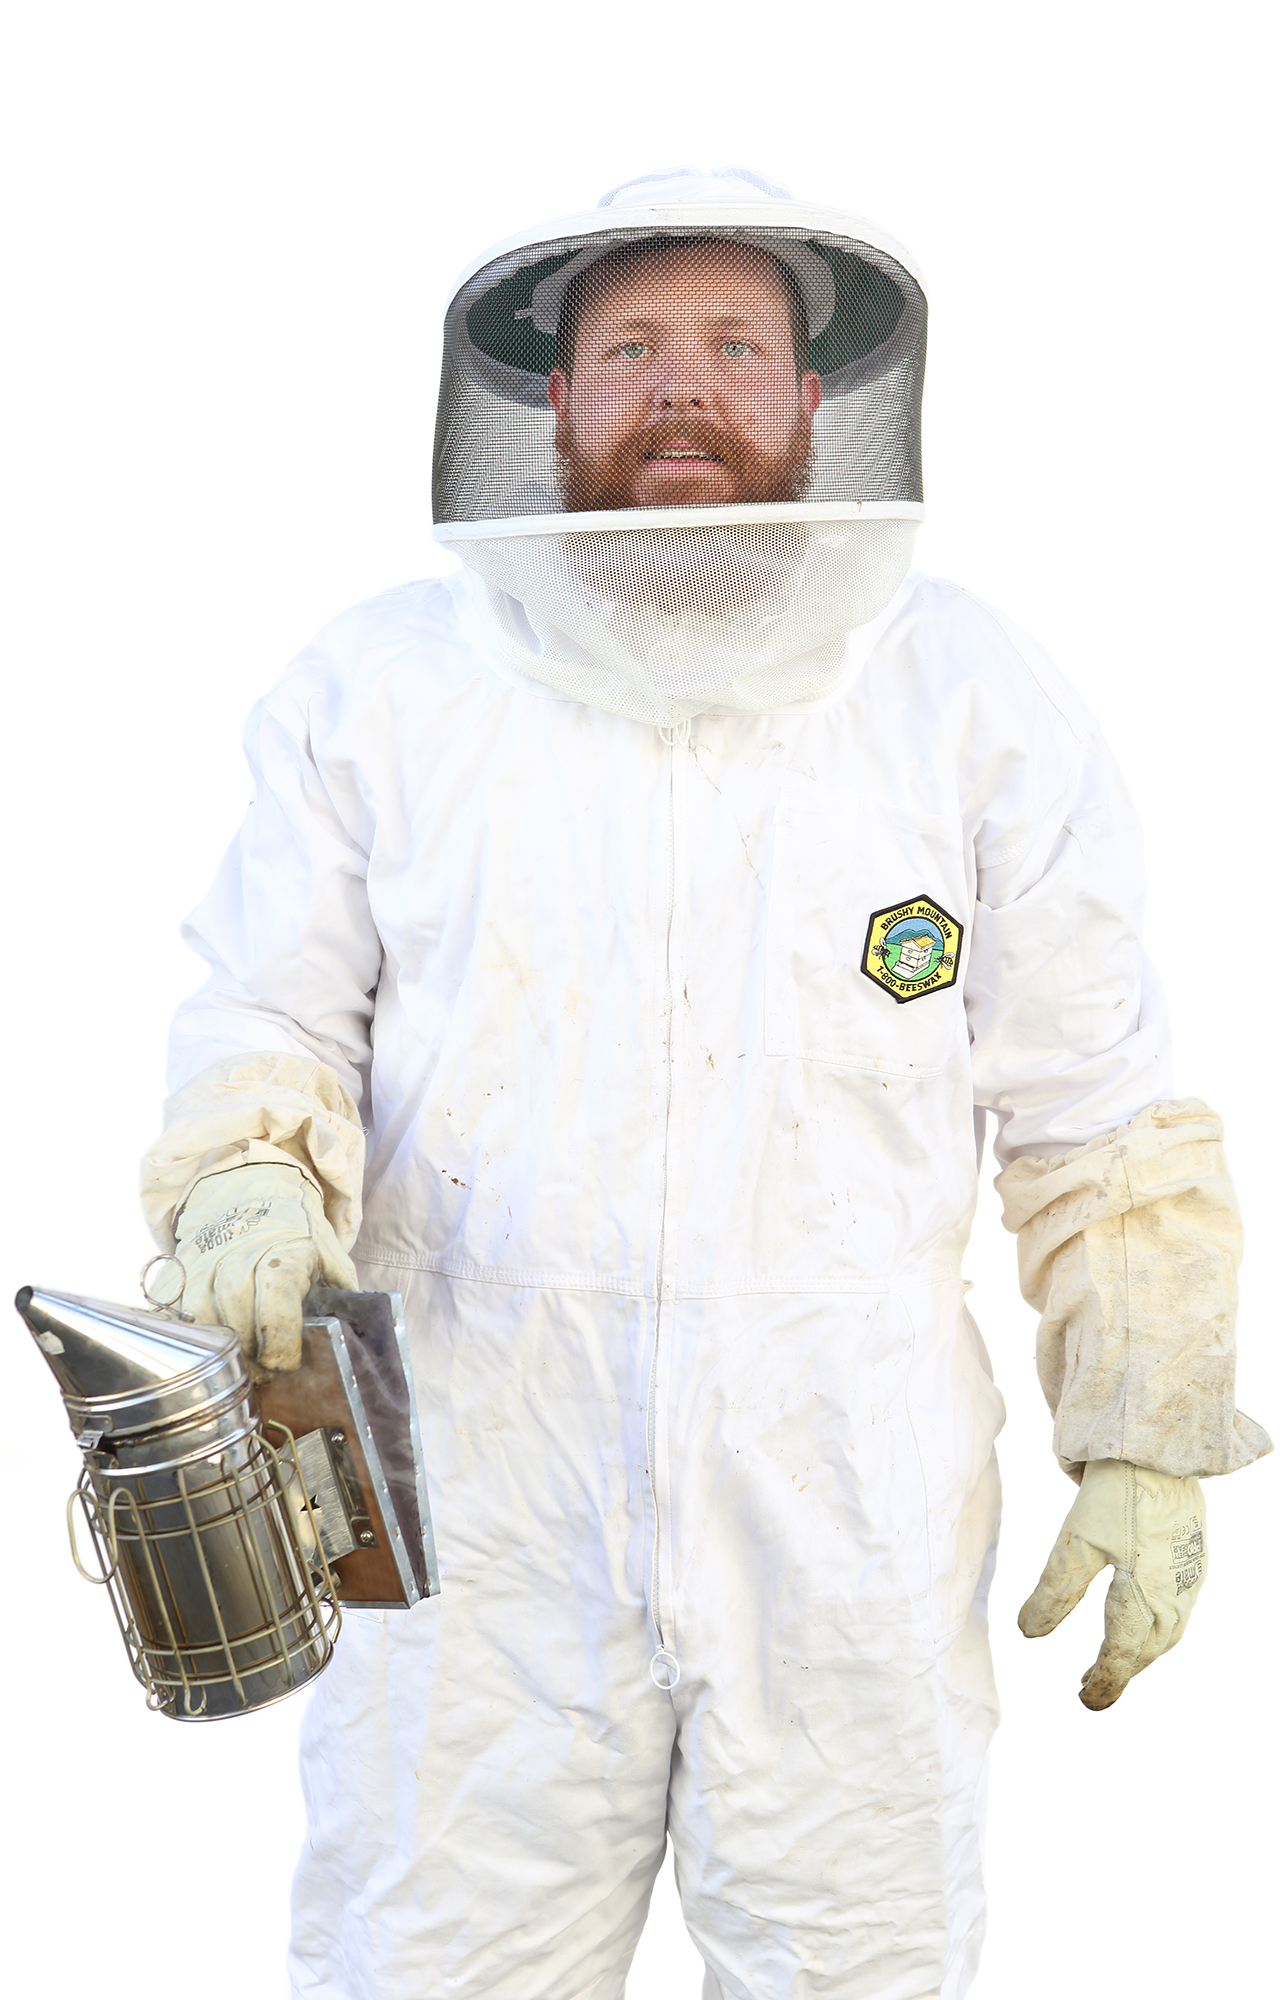 Harry the beekeeper.